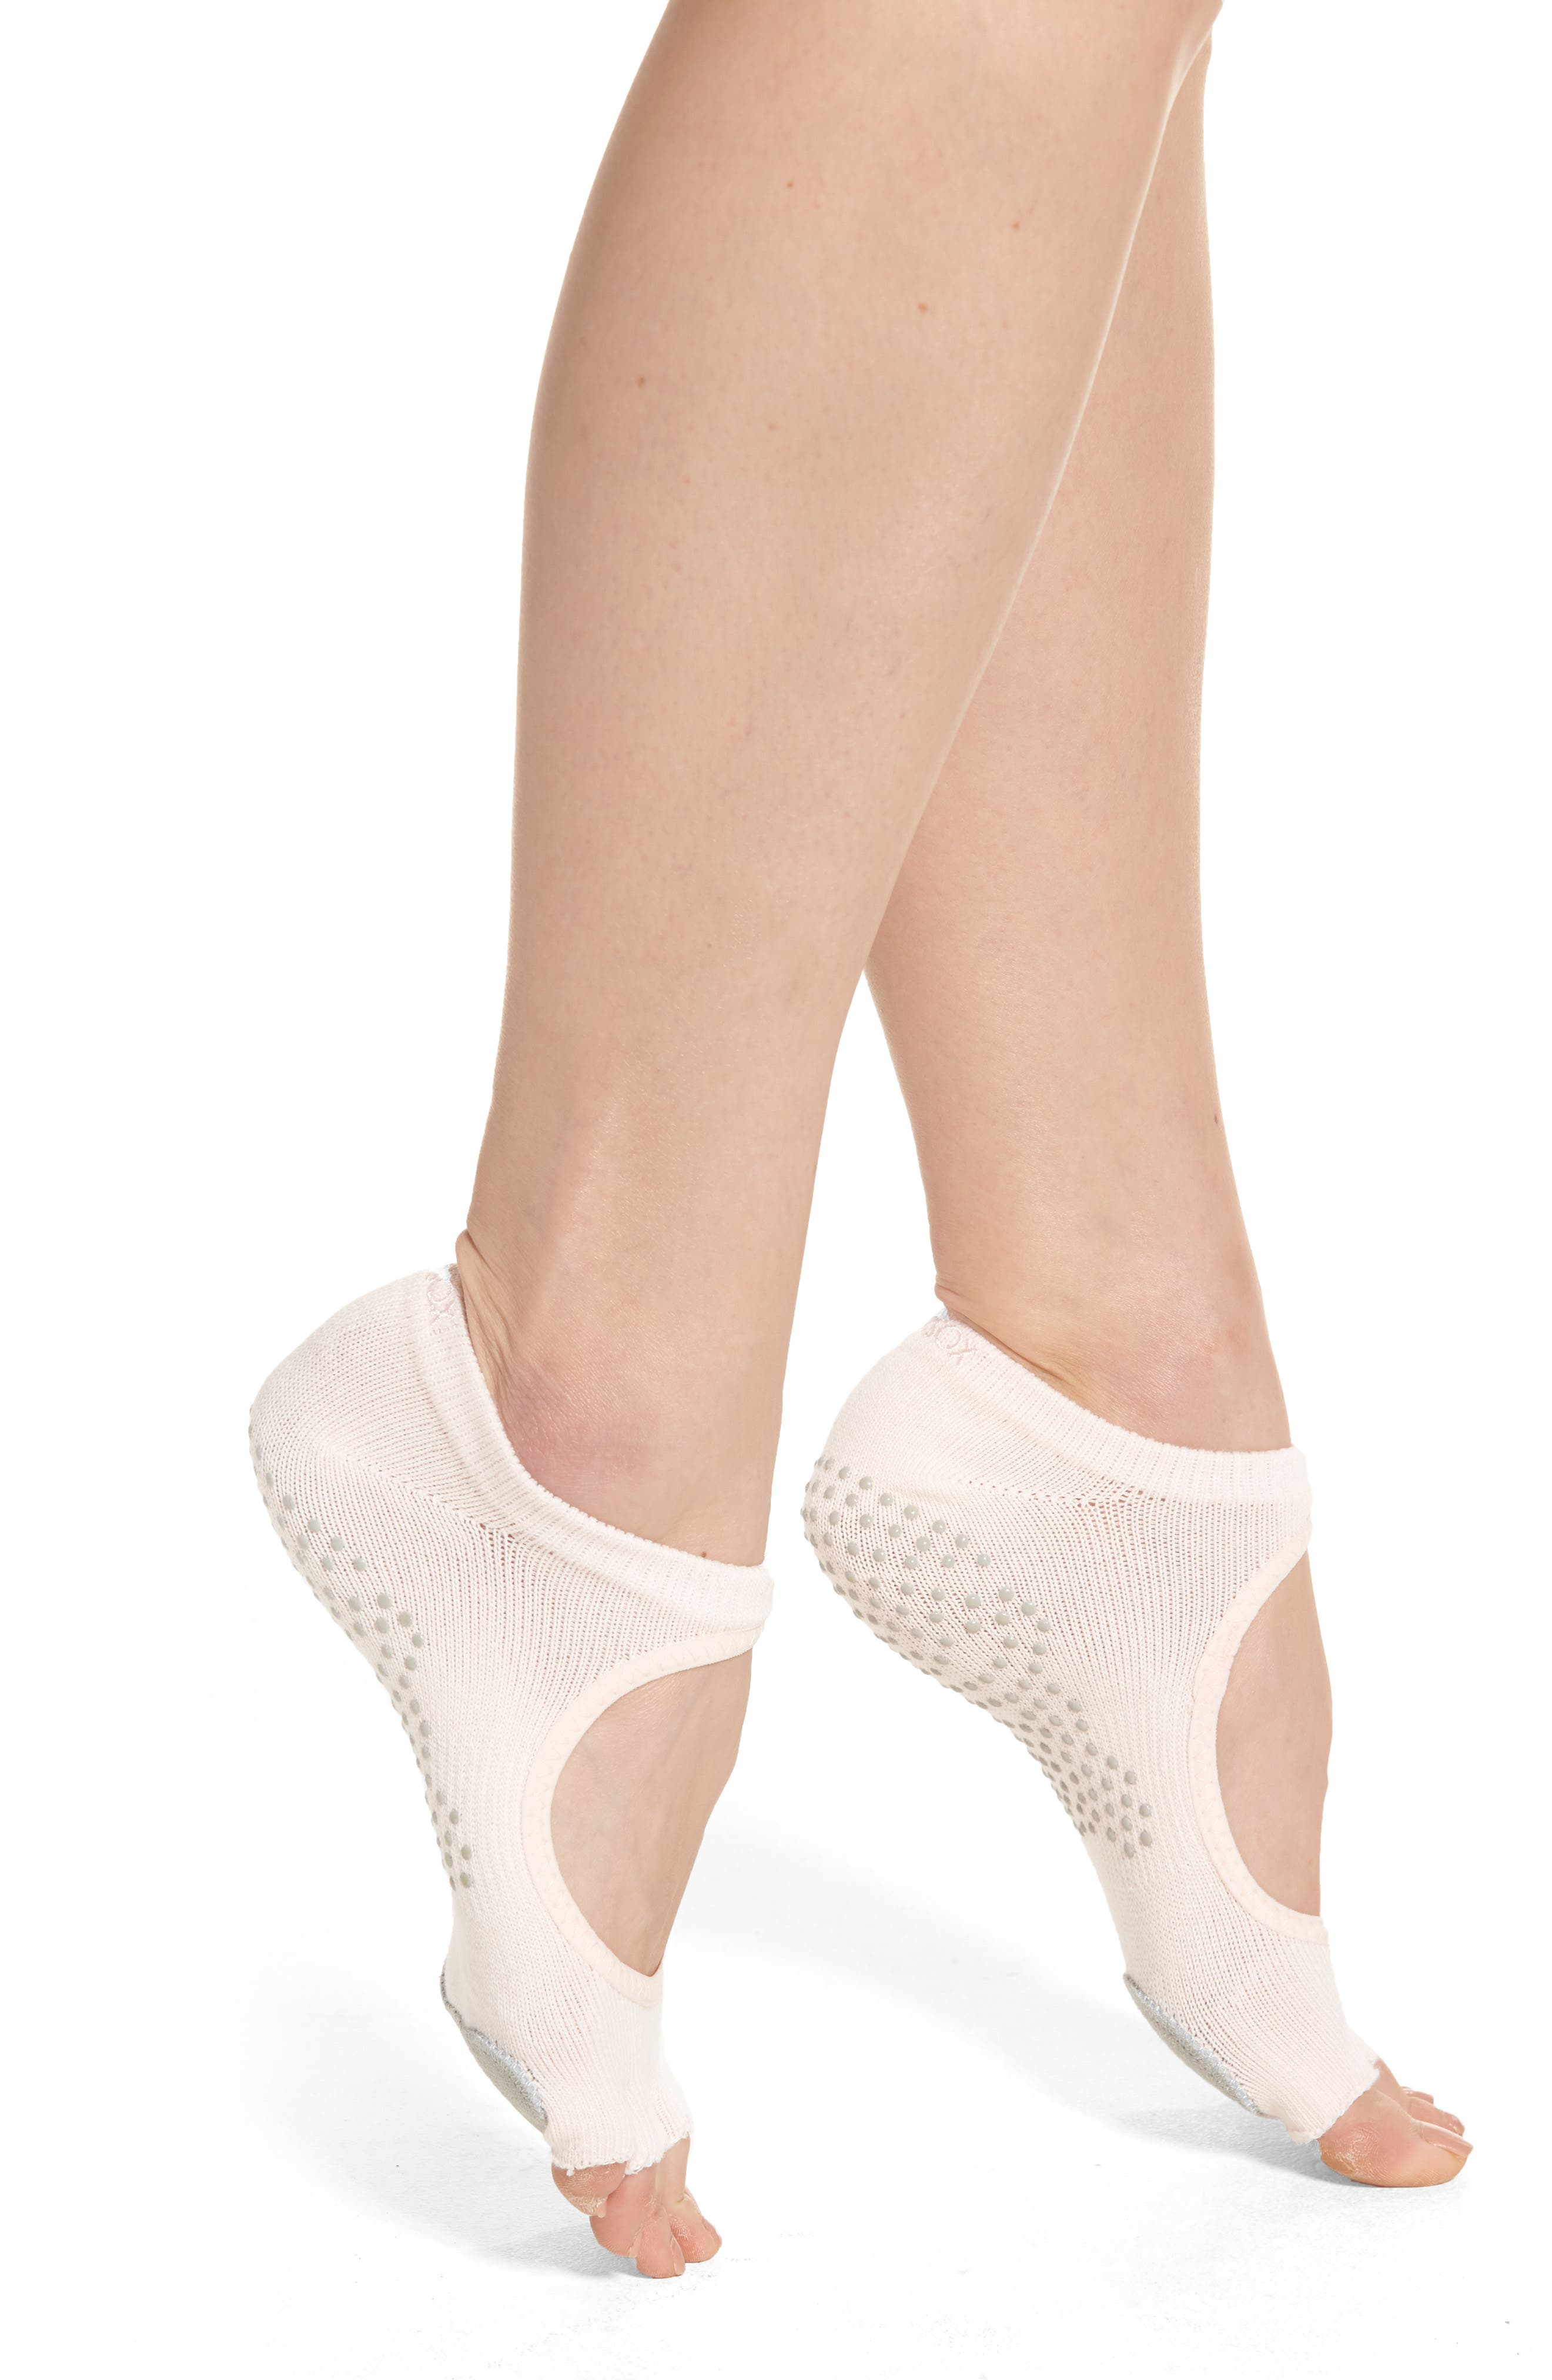 ToeSox 'Dance Plié' Half-Toe Gripper Socks